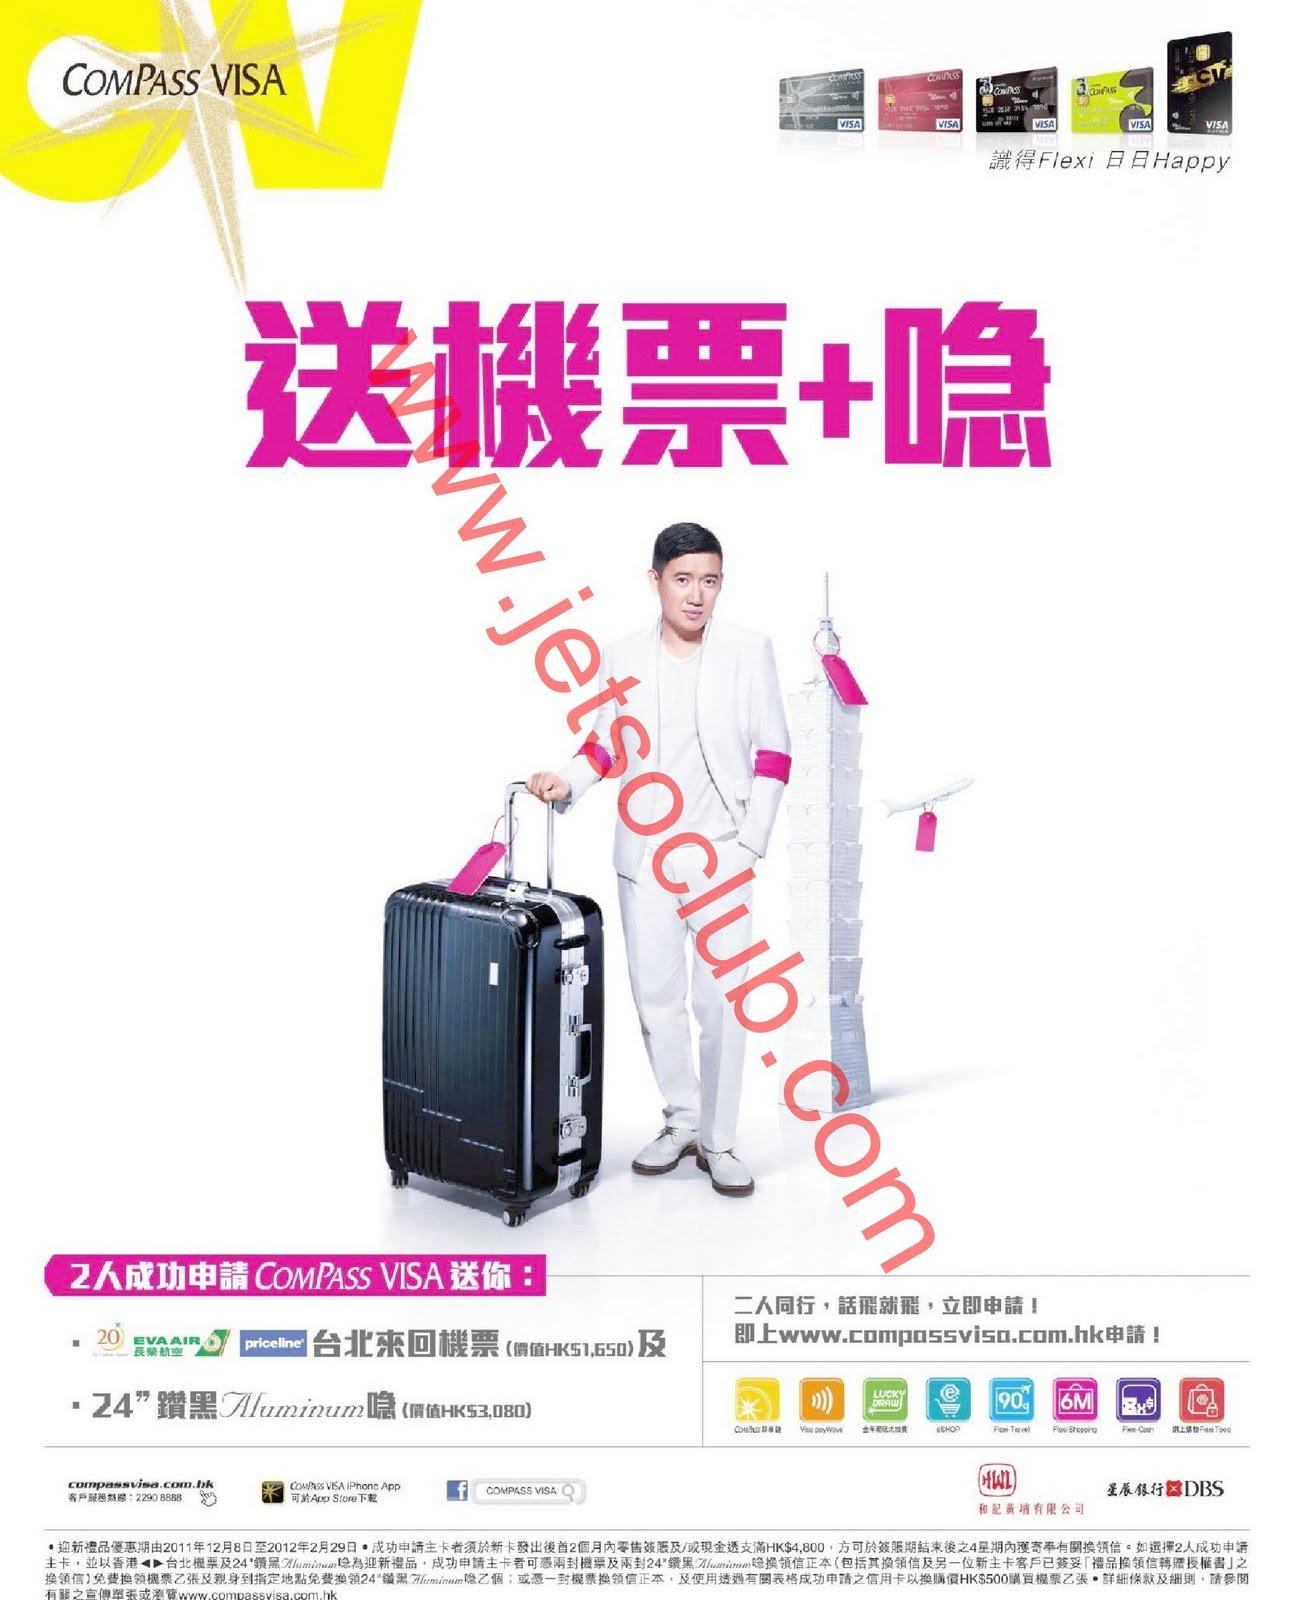 Compass Visa:迎新禮物 送機票+喼(至29/2) ( Jetso Club 著數俱樂部 )